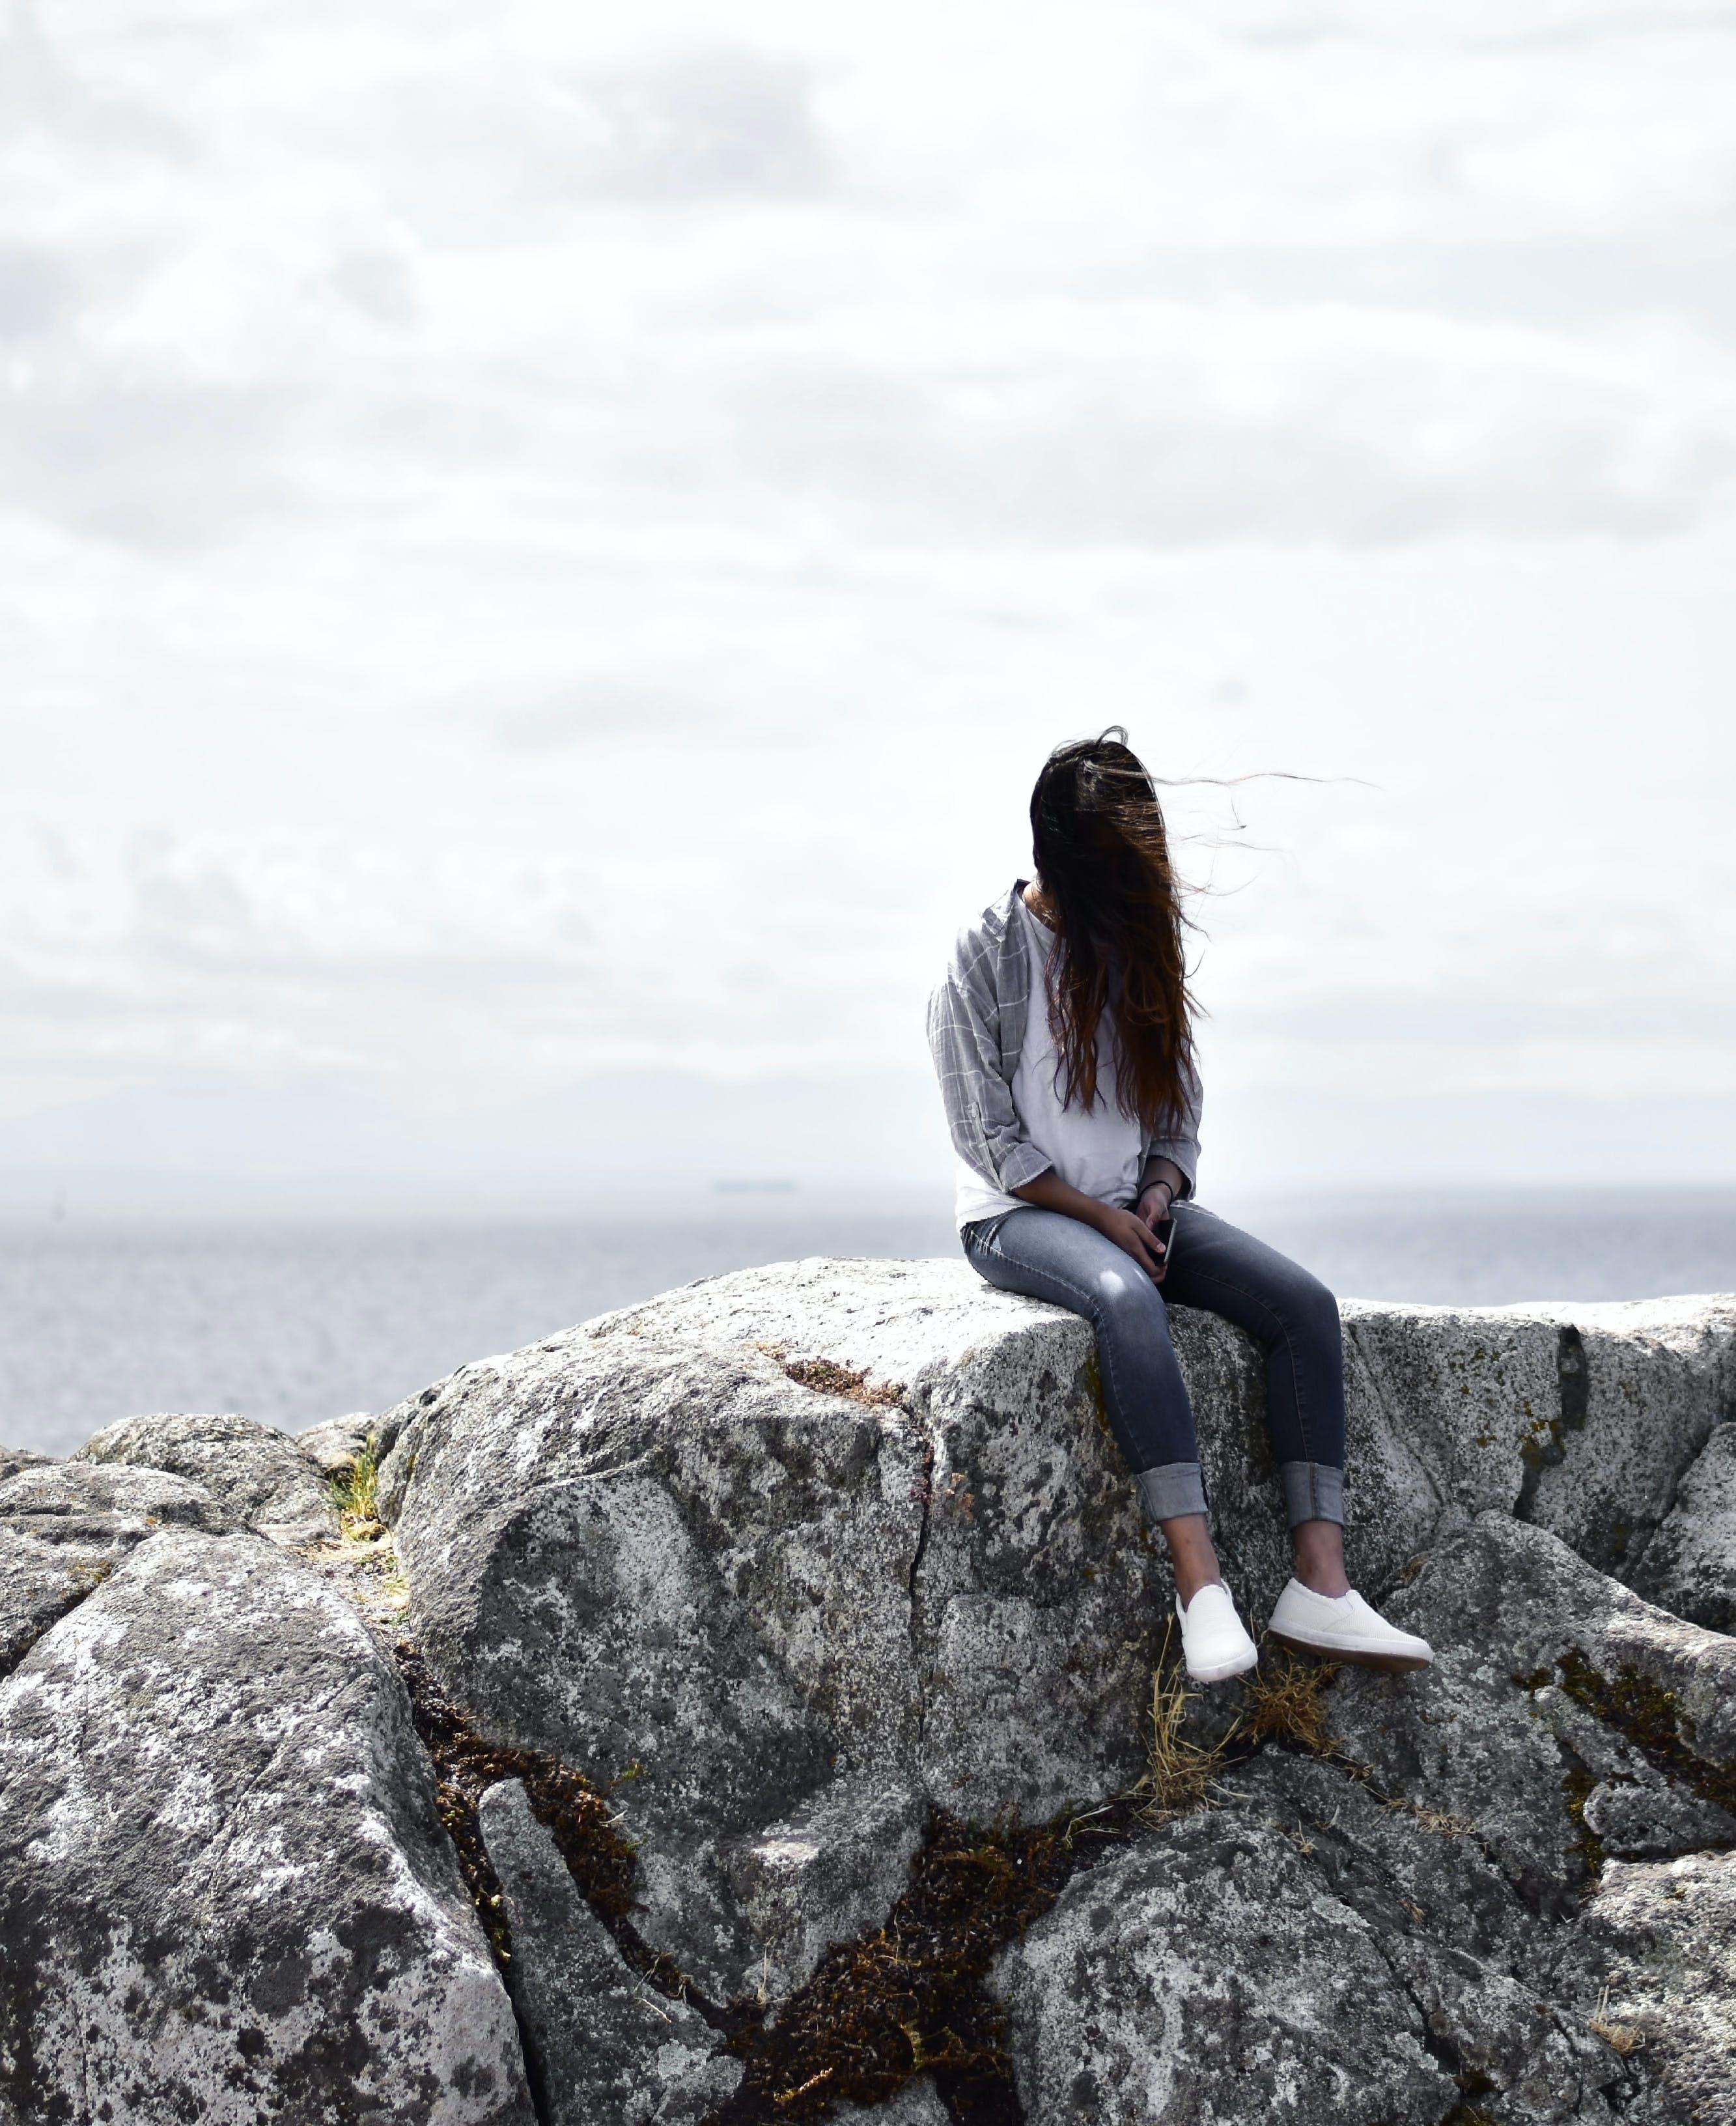 Woman Sits on Gray Rock